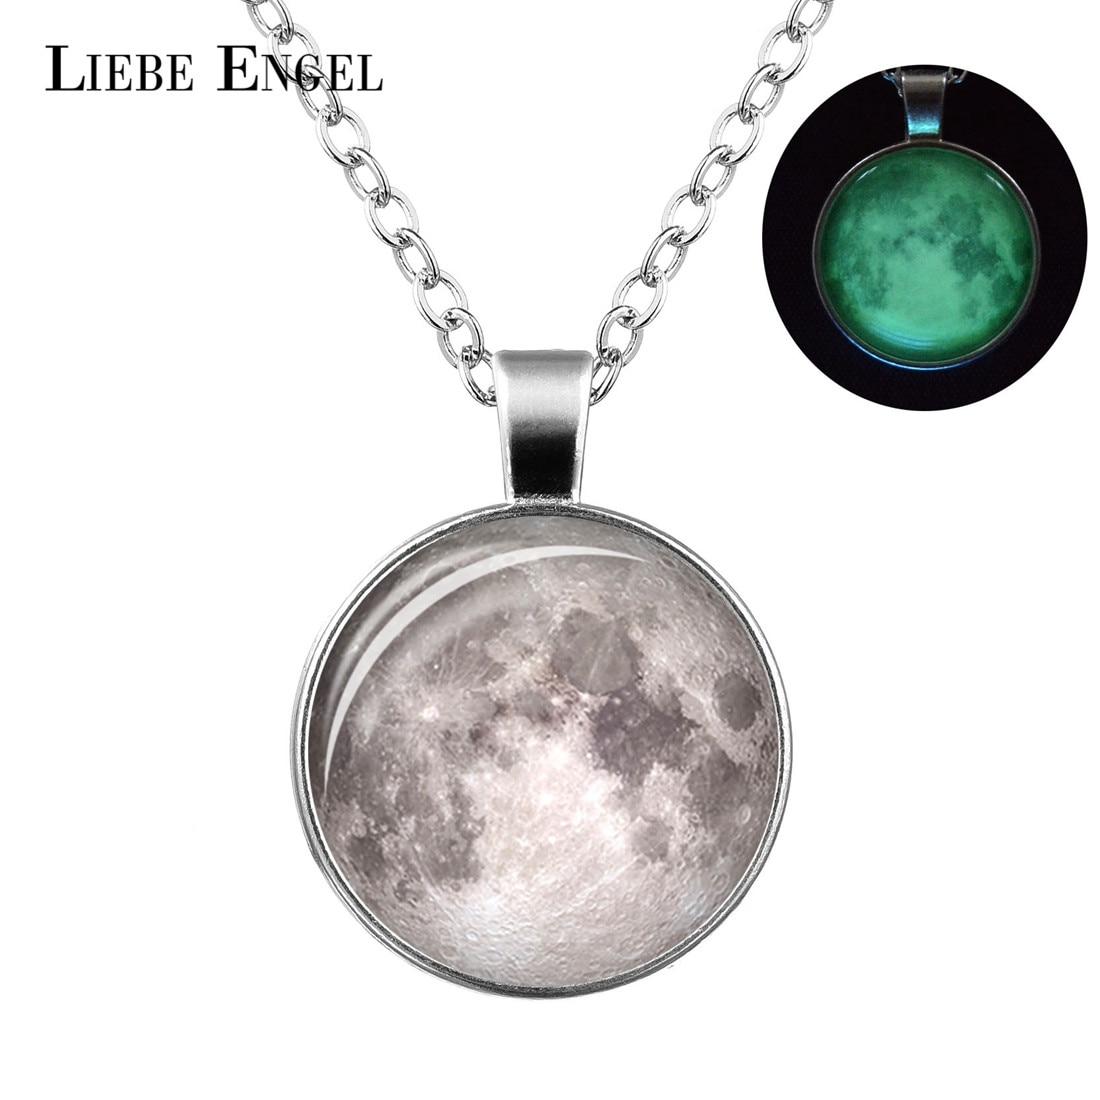 LIEBE ENGEL Glowing in the Dark Galaxy Moon Pendant Necklace